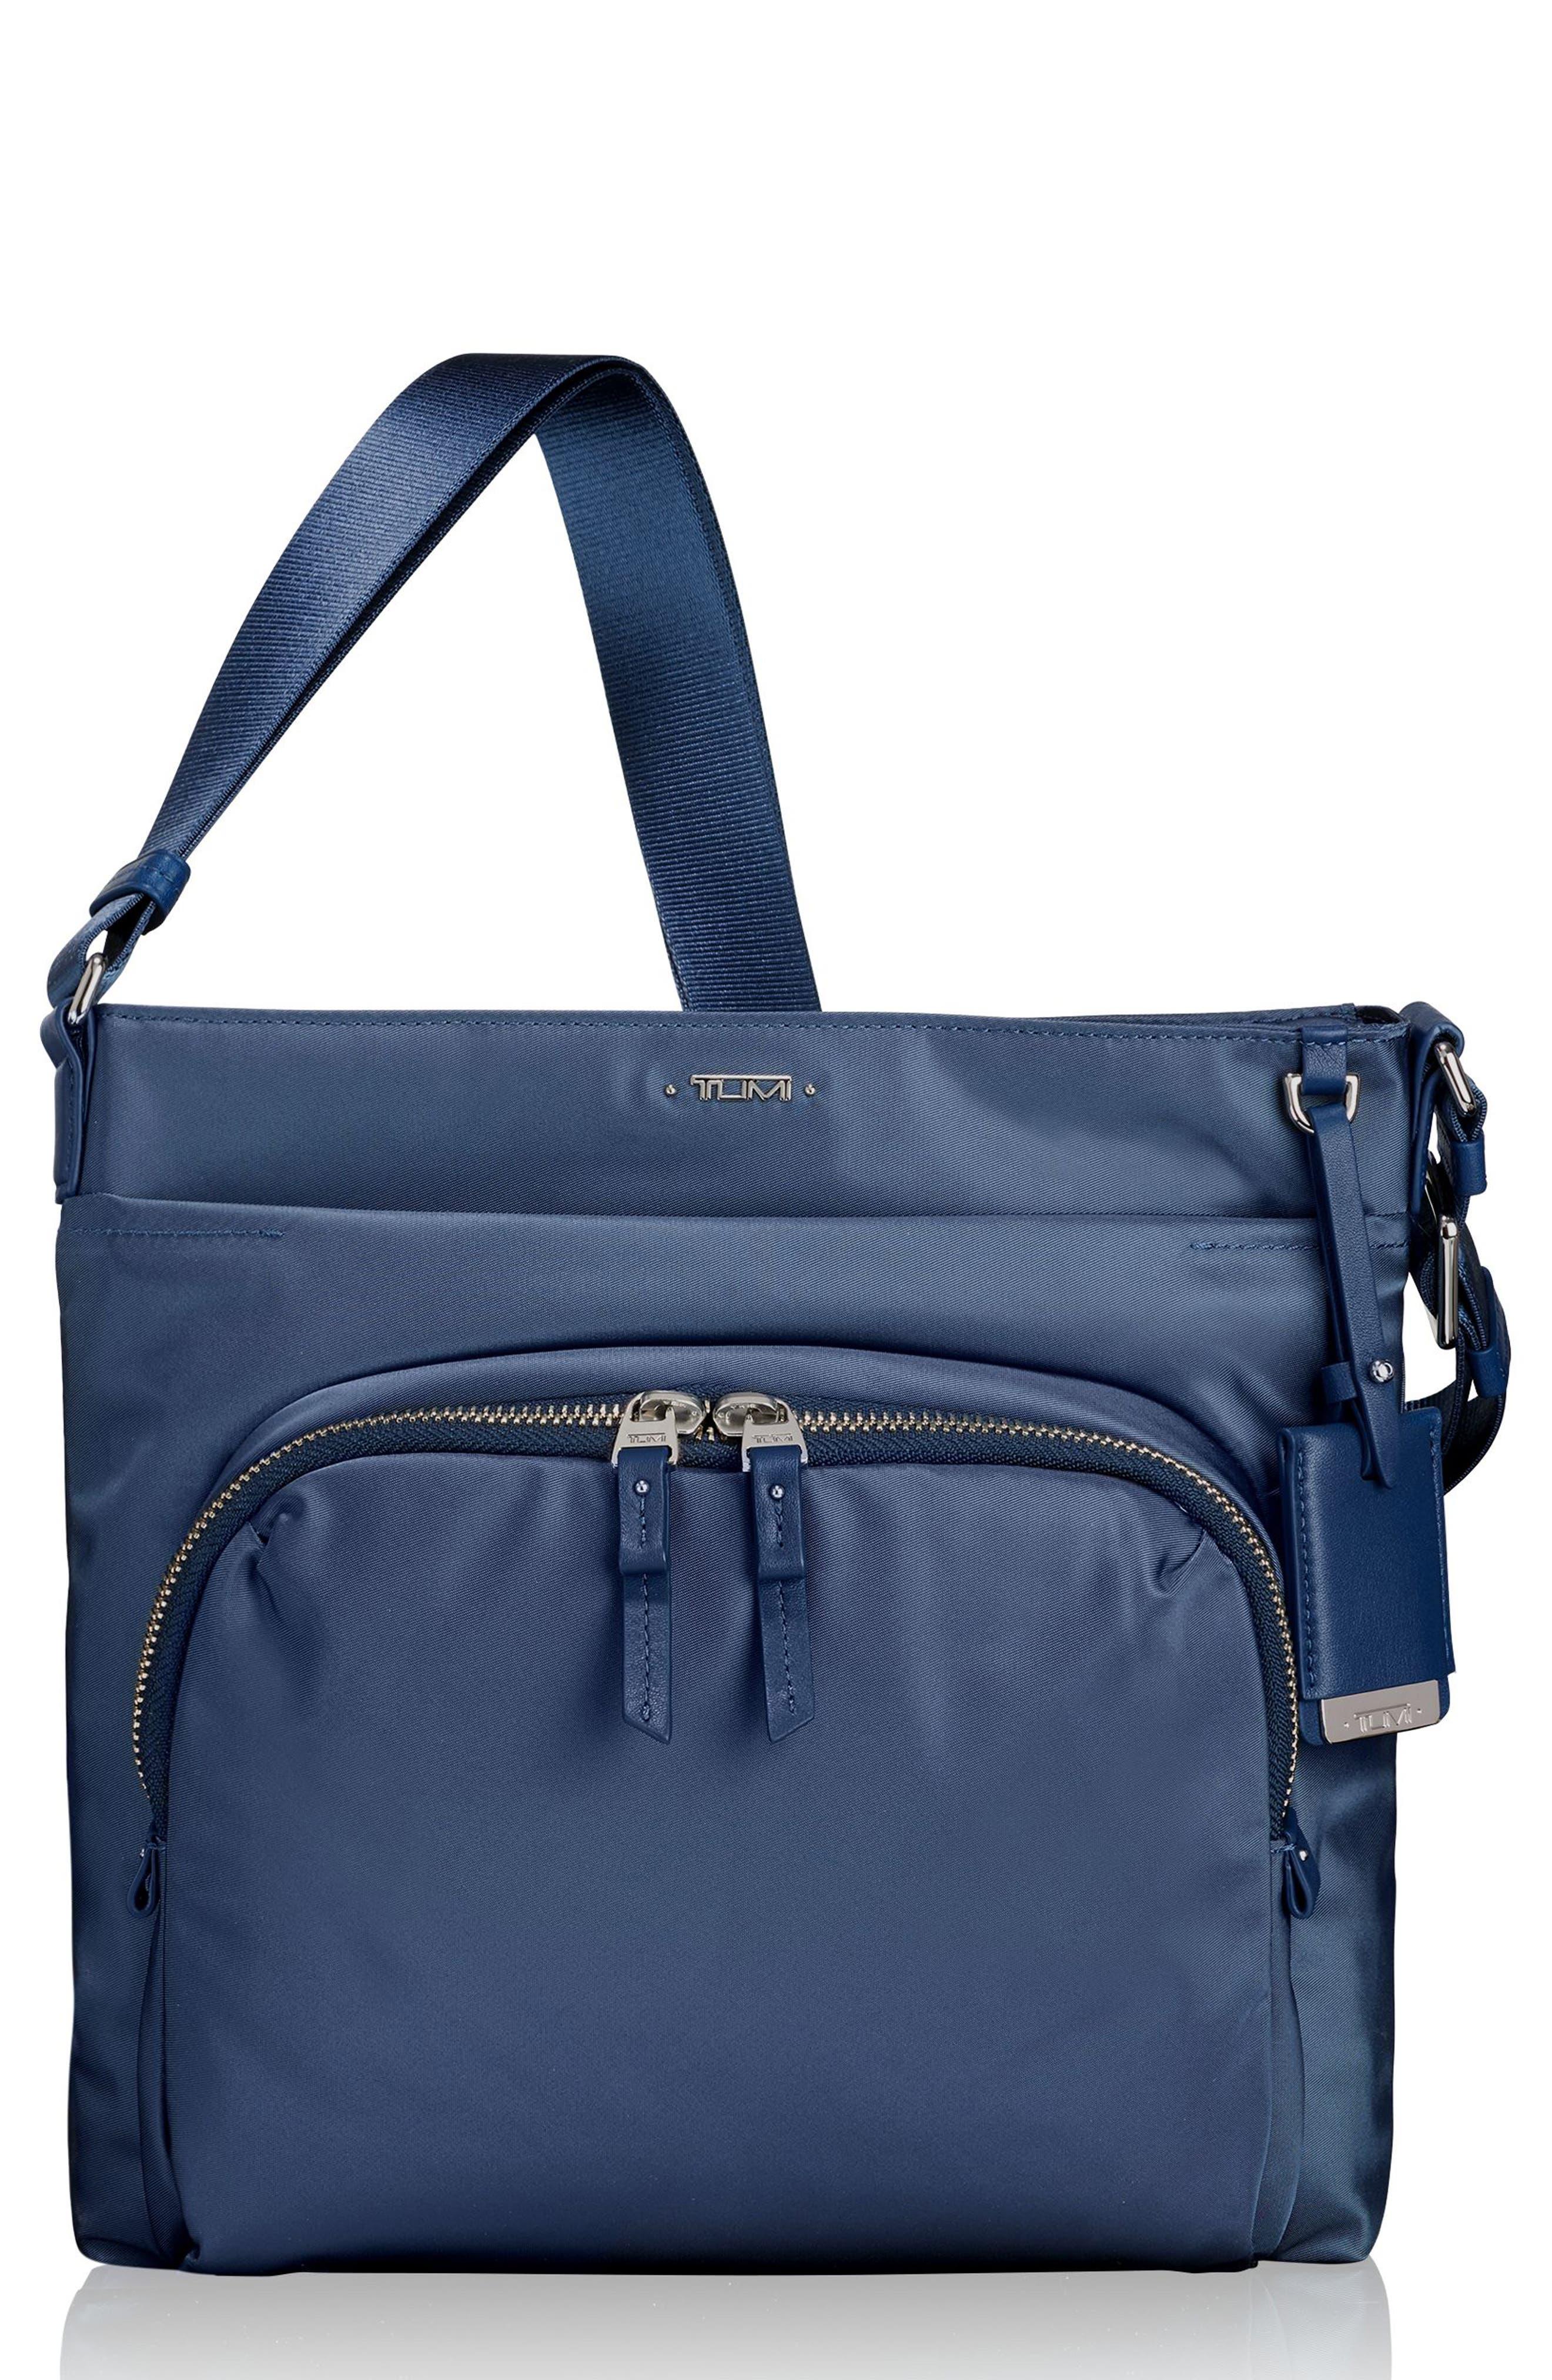 Voyageur - Capri Nylon Crossbody Bag,                             Main thumbnail 12, color,